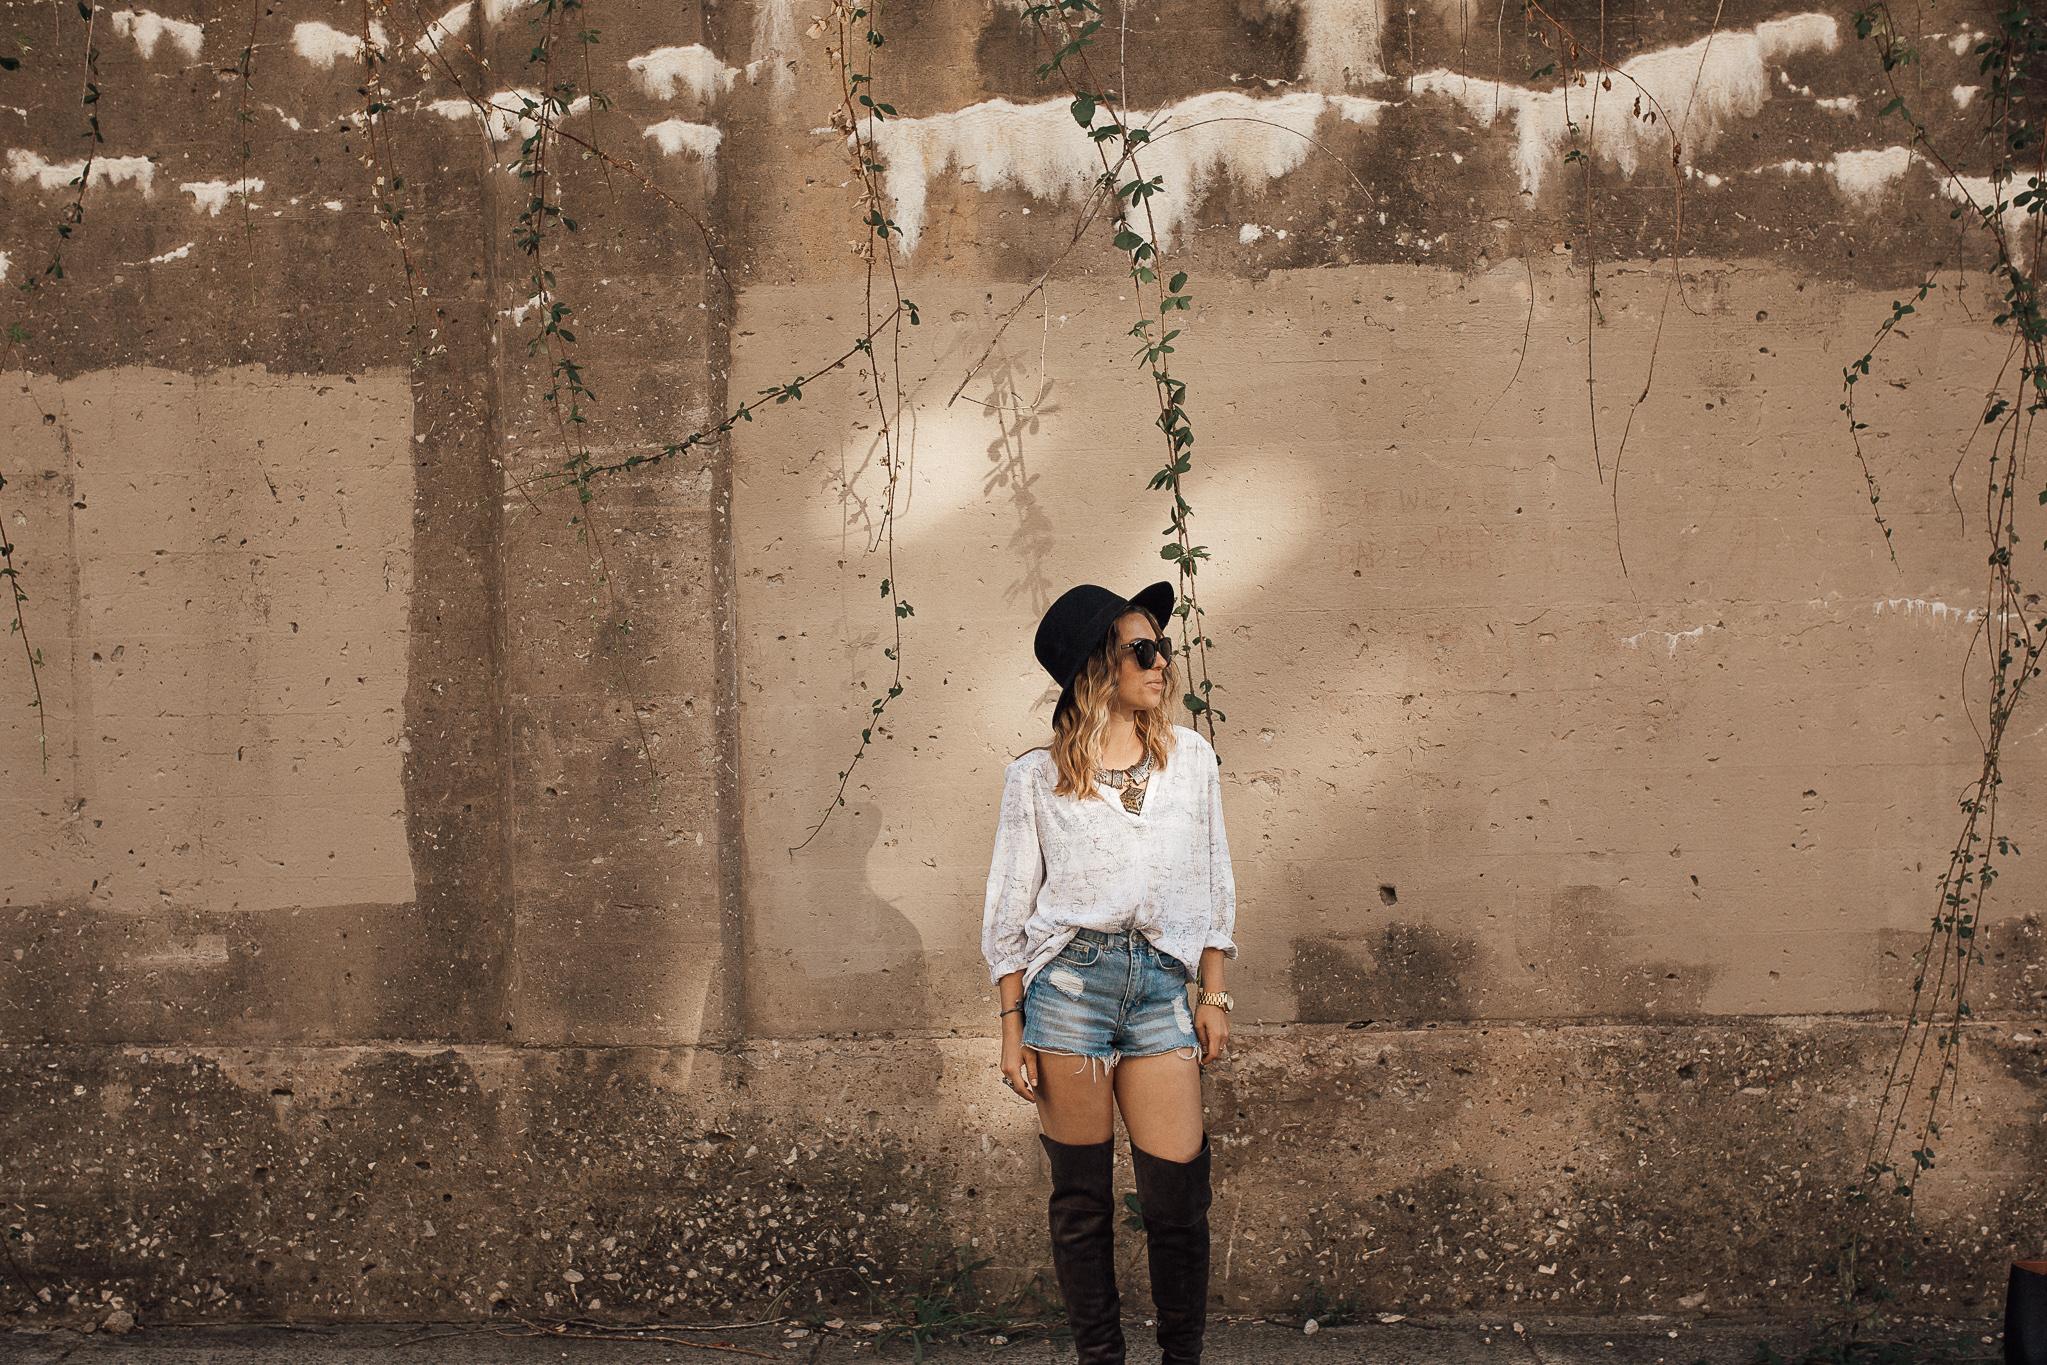 memphis-tennessee-portrait-photographer-downtown-memphis-urban-style-fashion